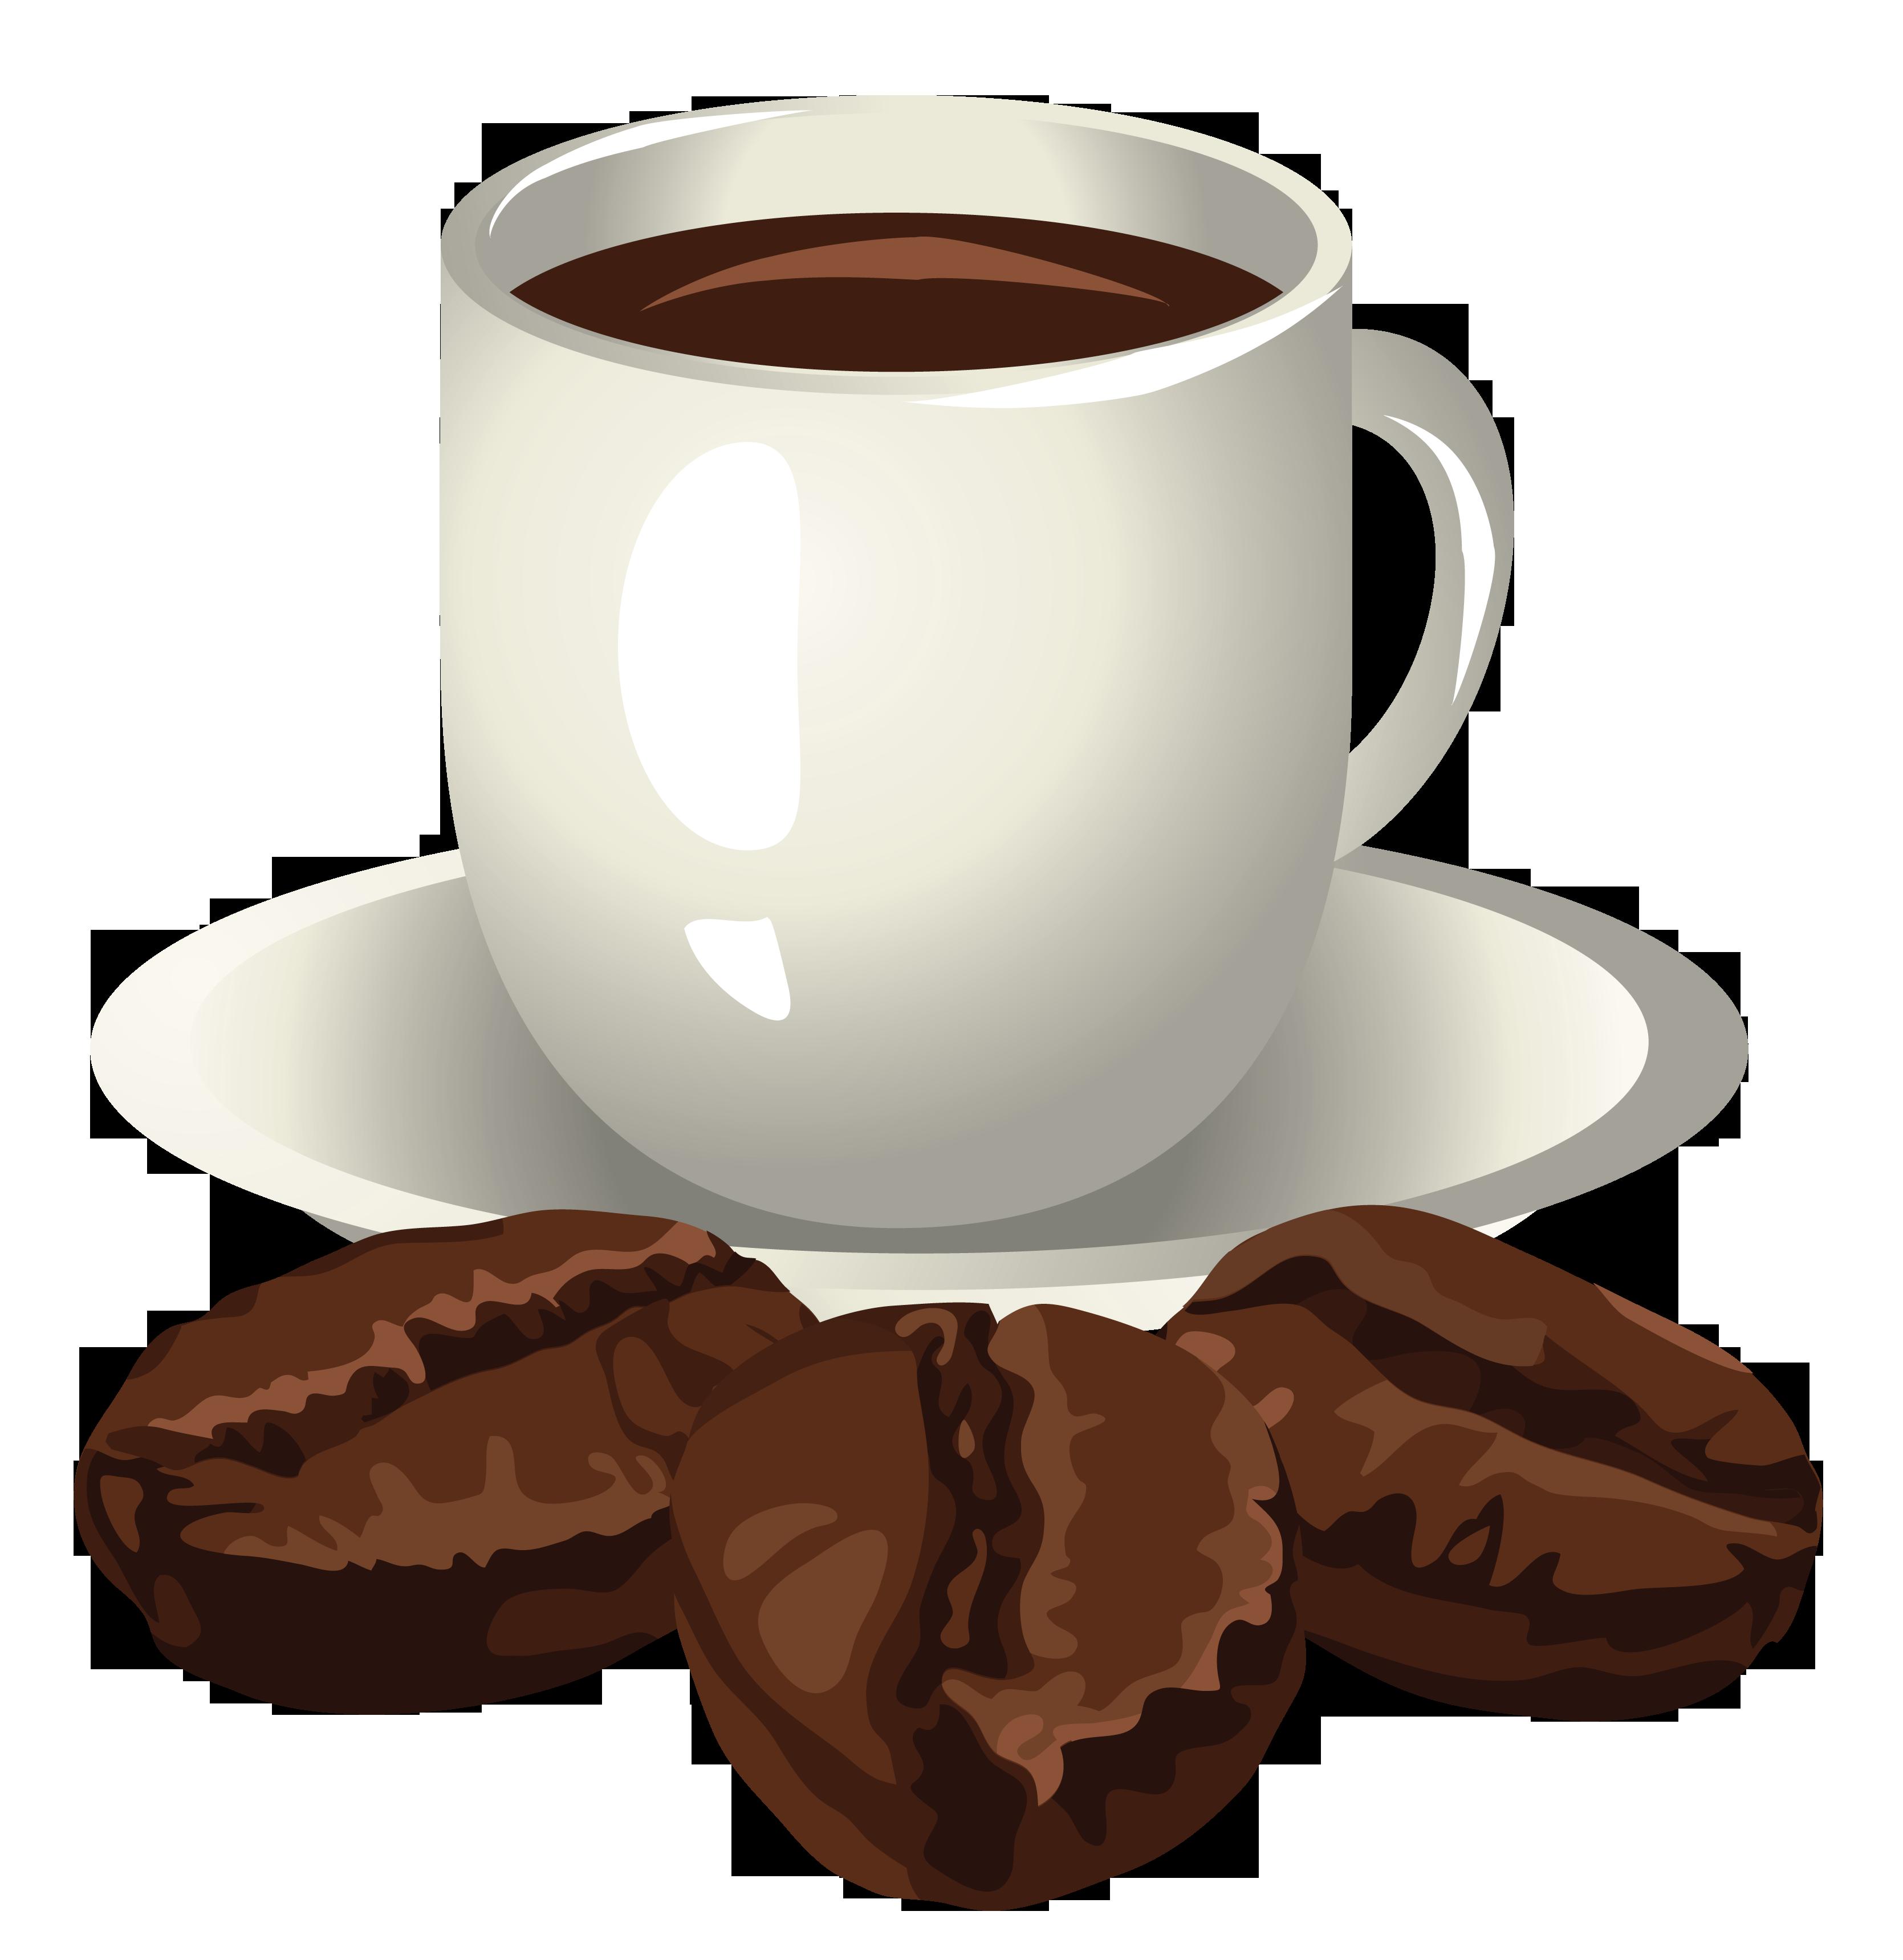 coffee can clip art - photo #33